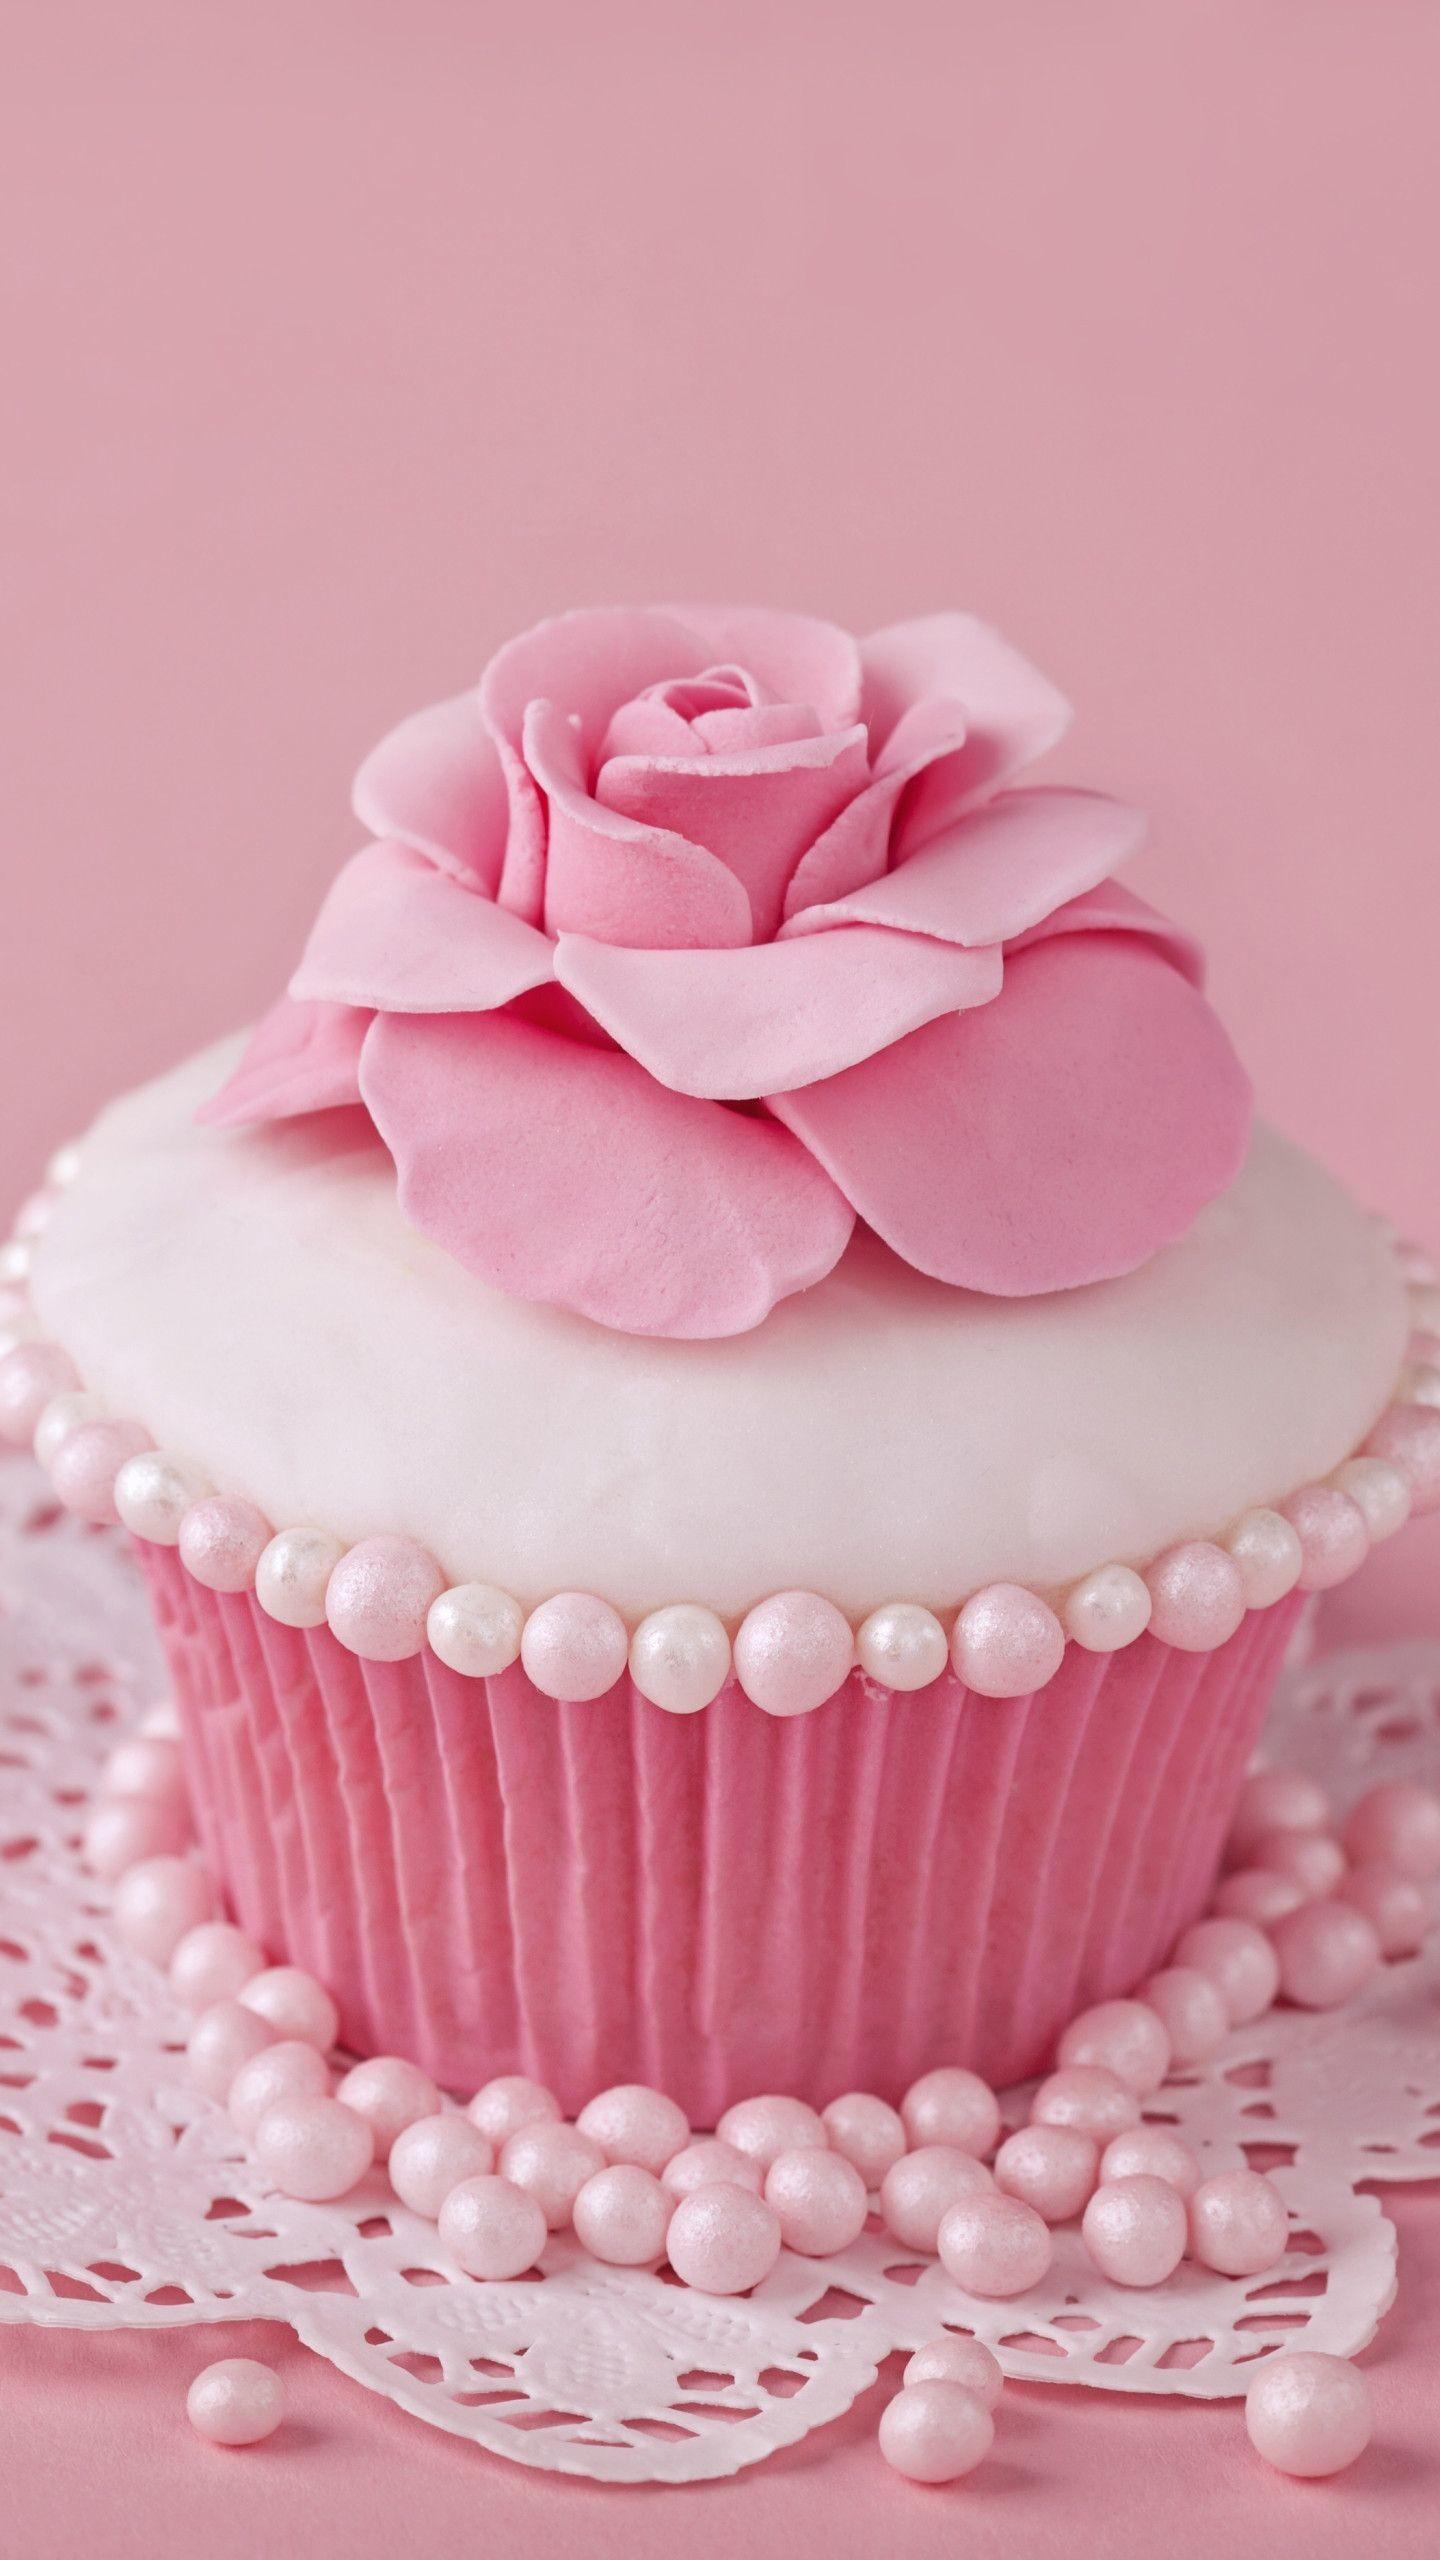 Res: 1440x2560,  Food Cupcake Pink Sweets Flower. Wallpaper 669585